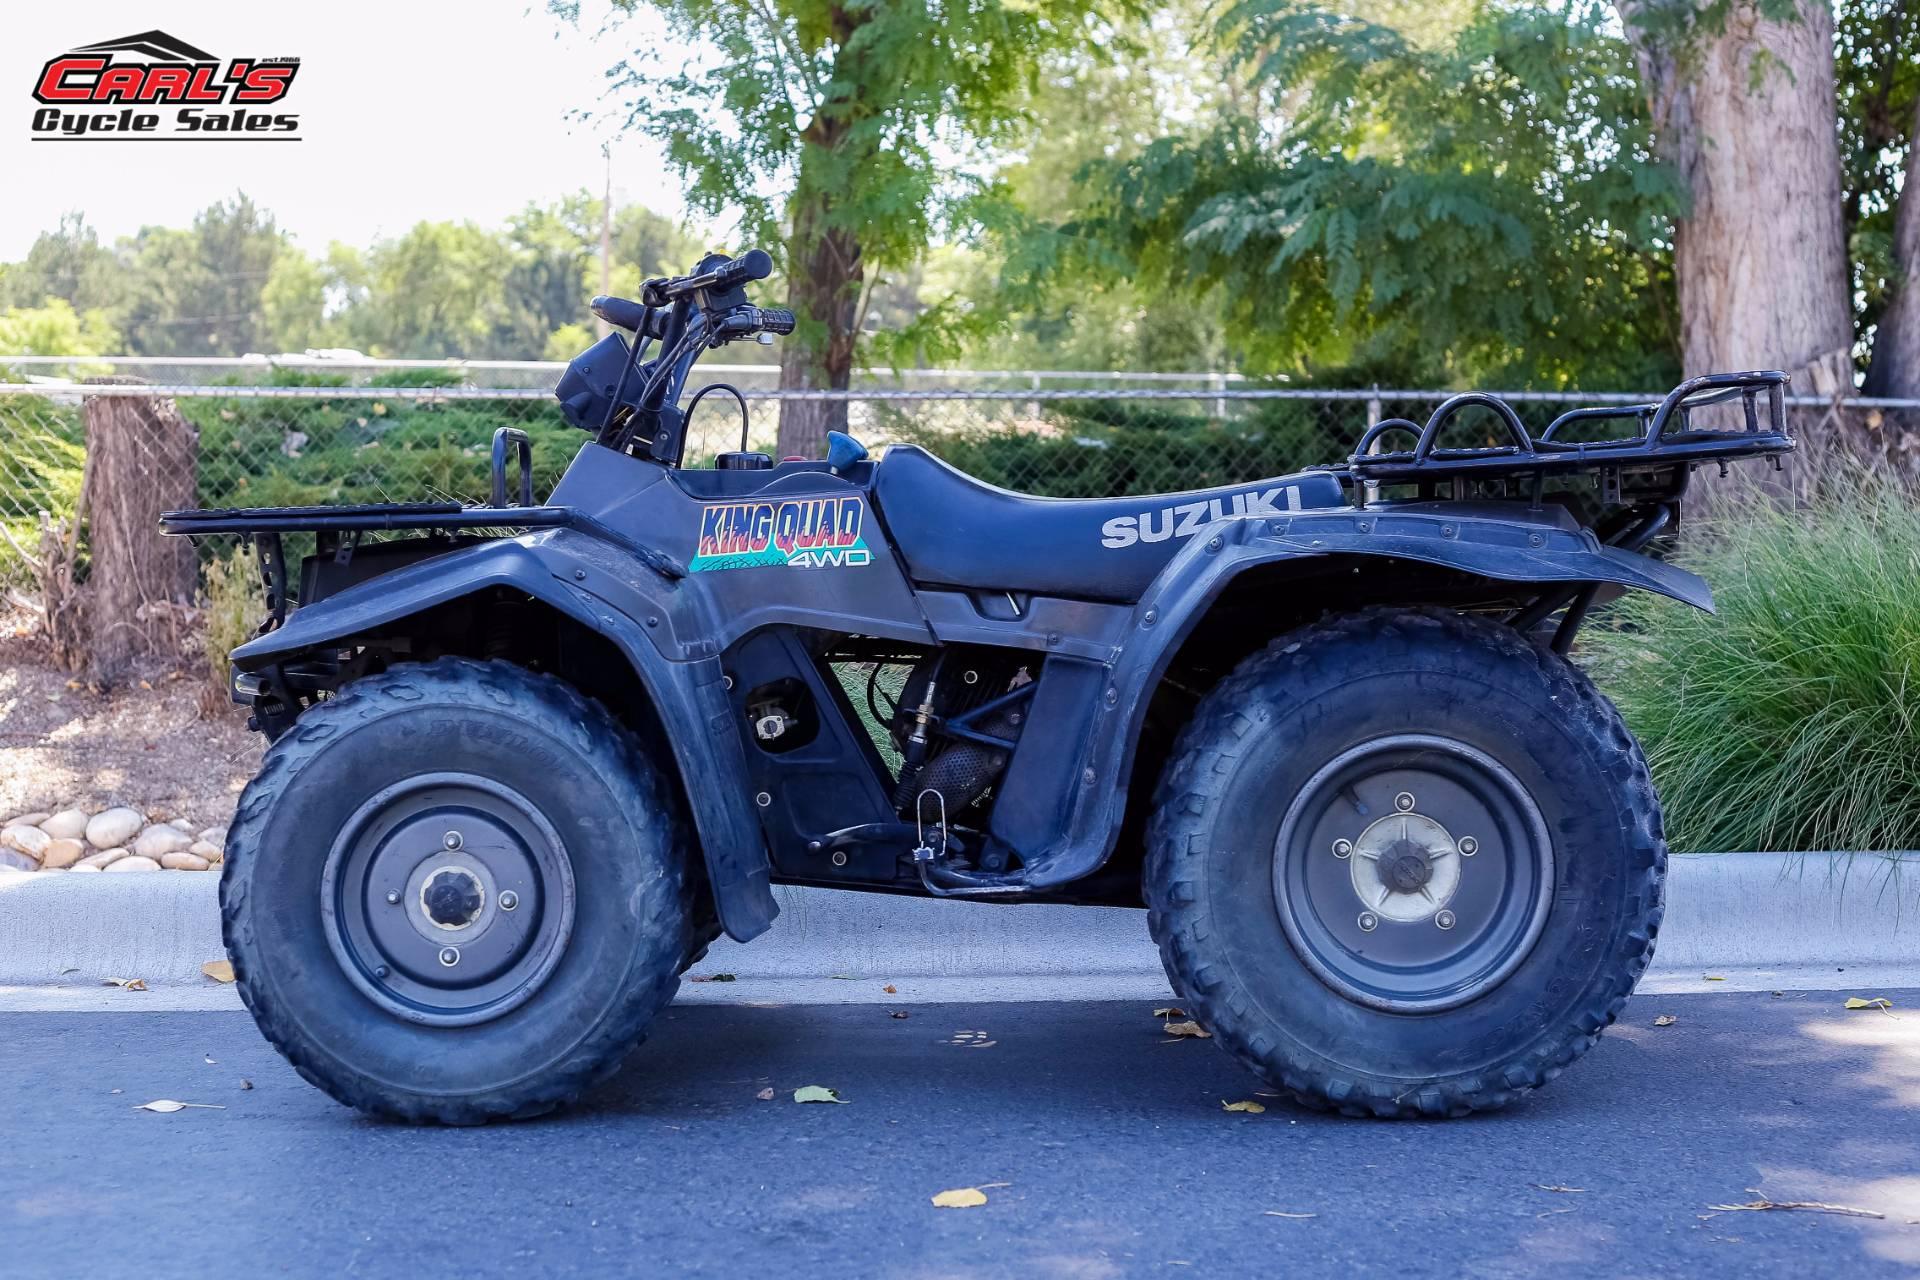 1996 Kingquad 400